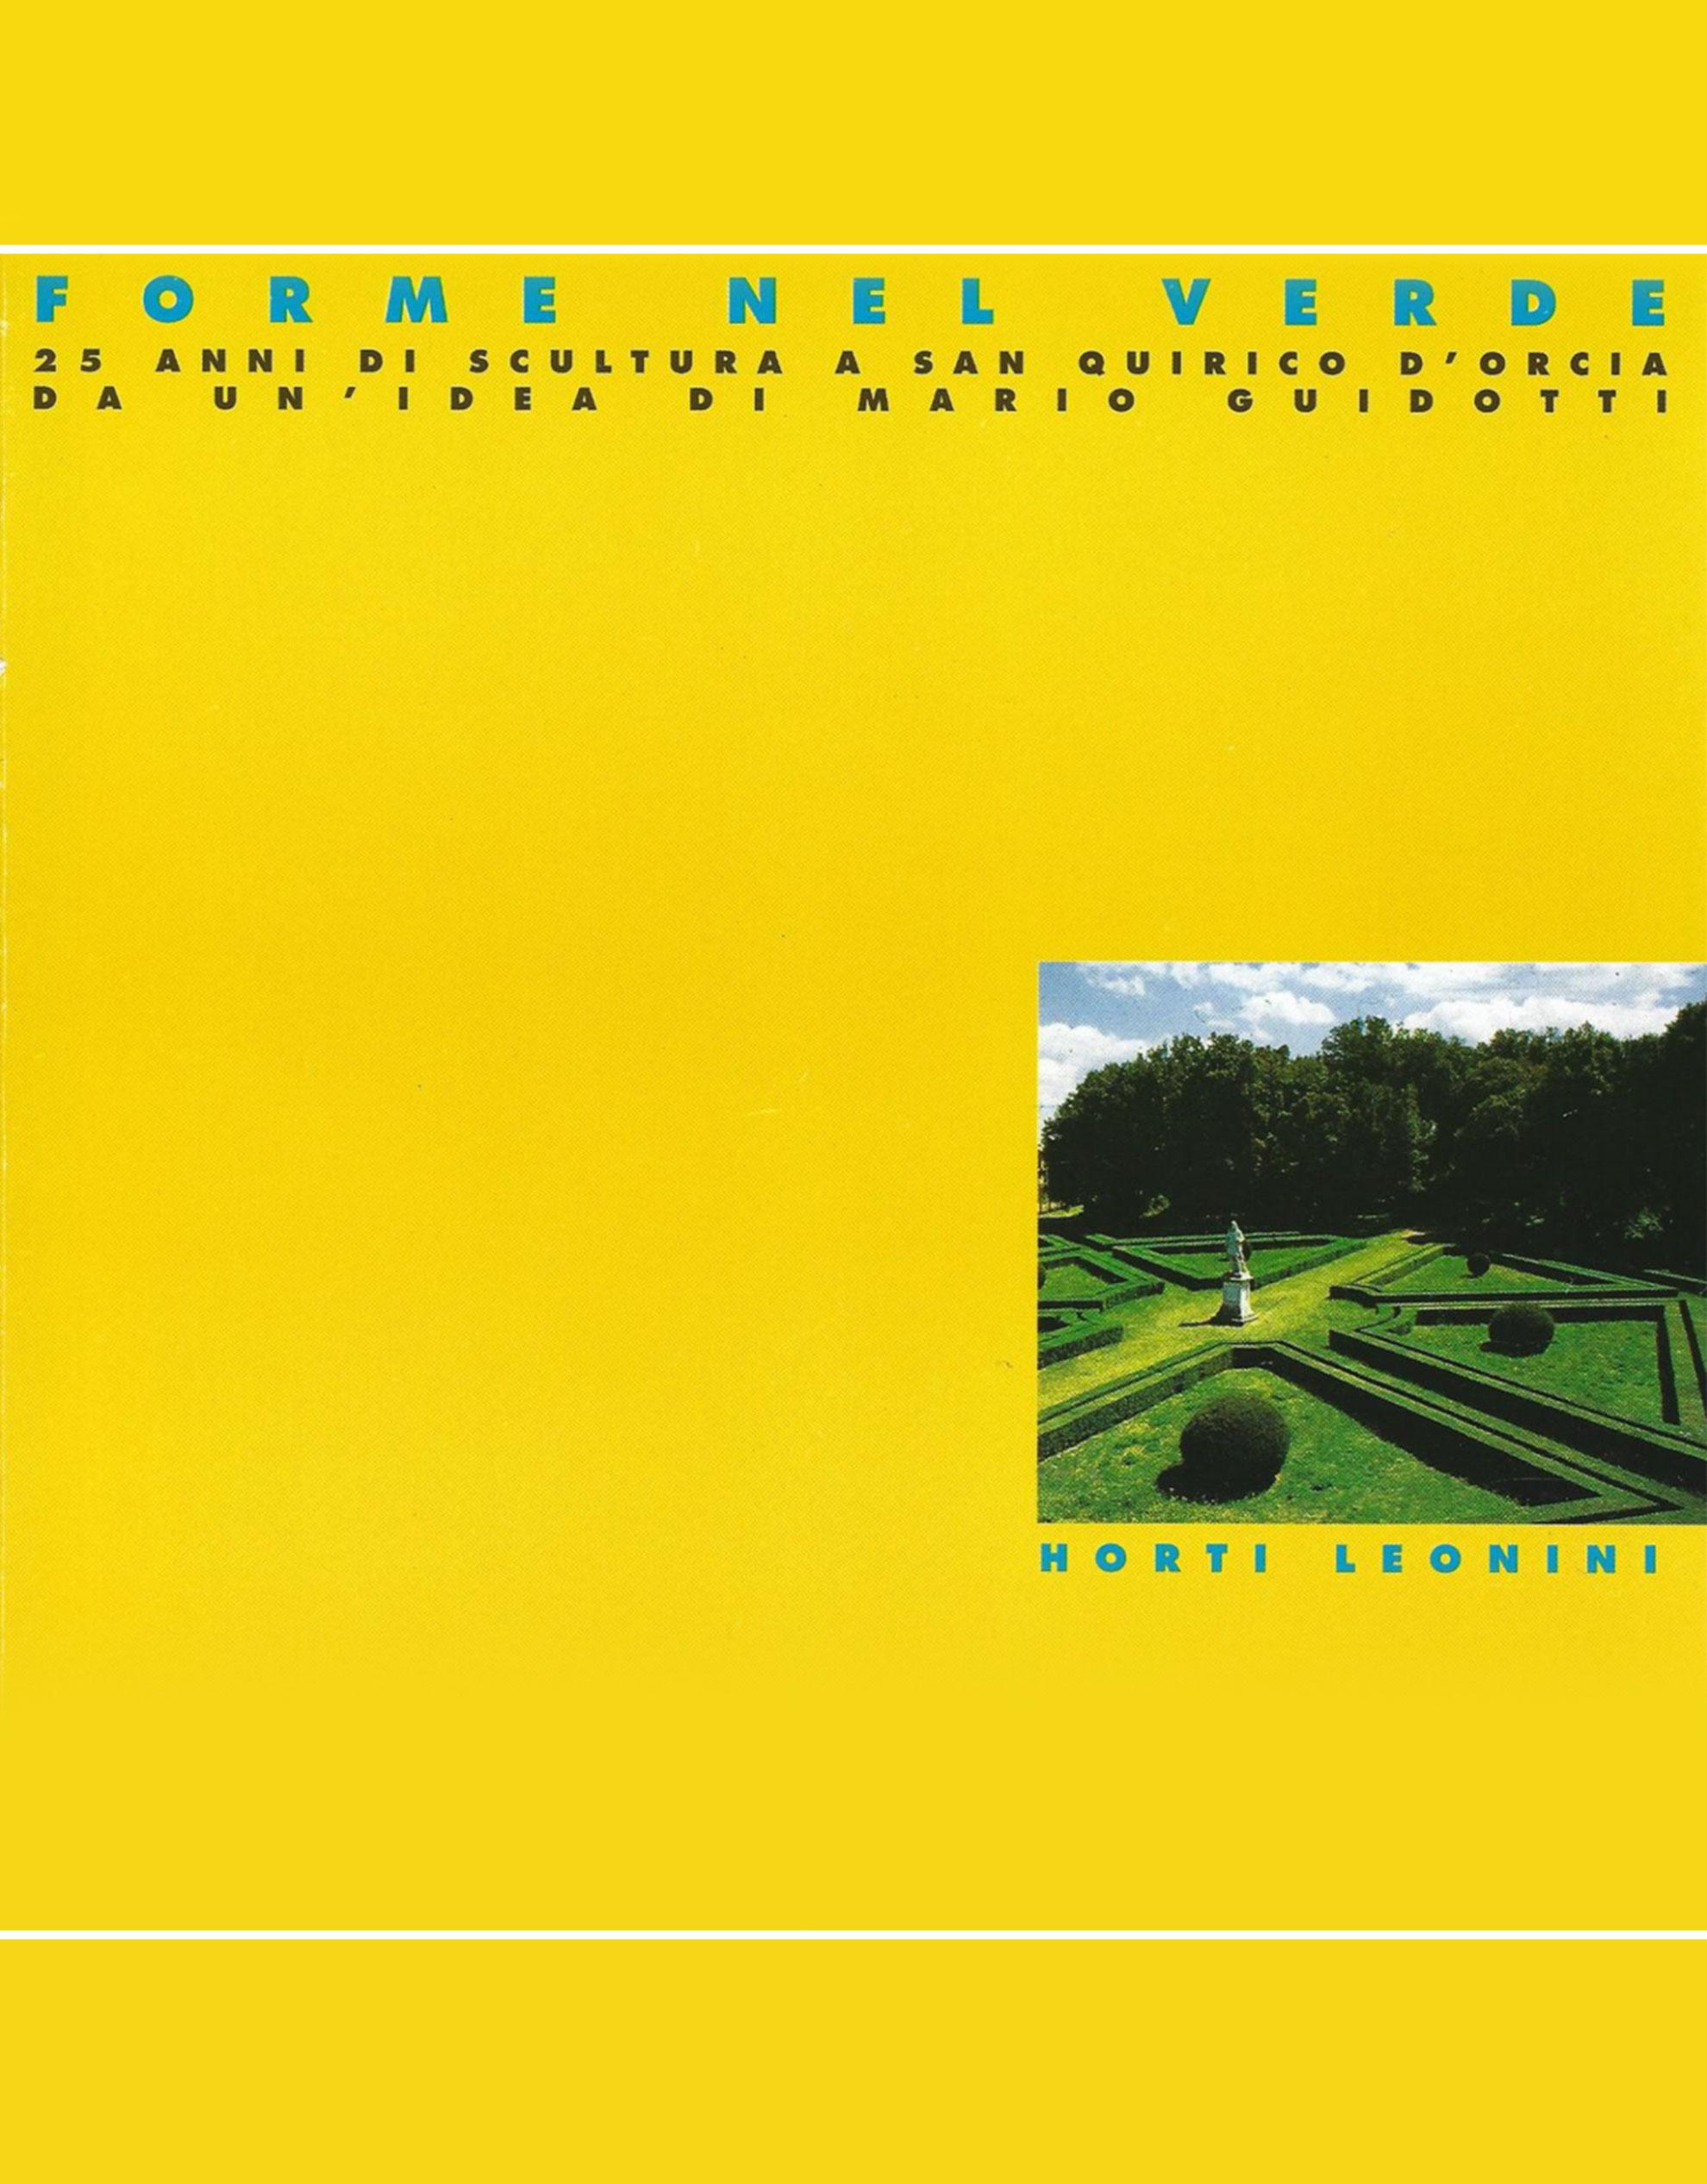 Catalogo Forme nel Verde 1995